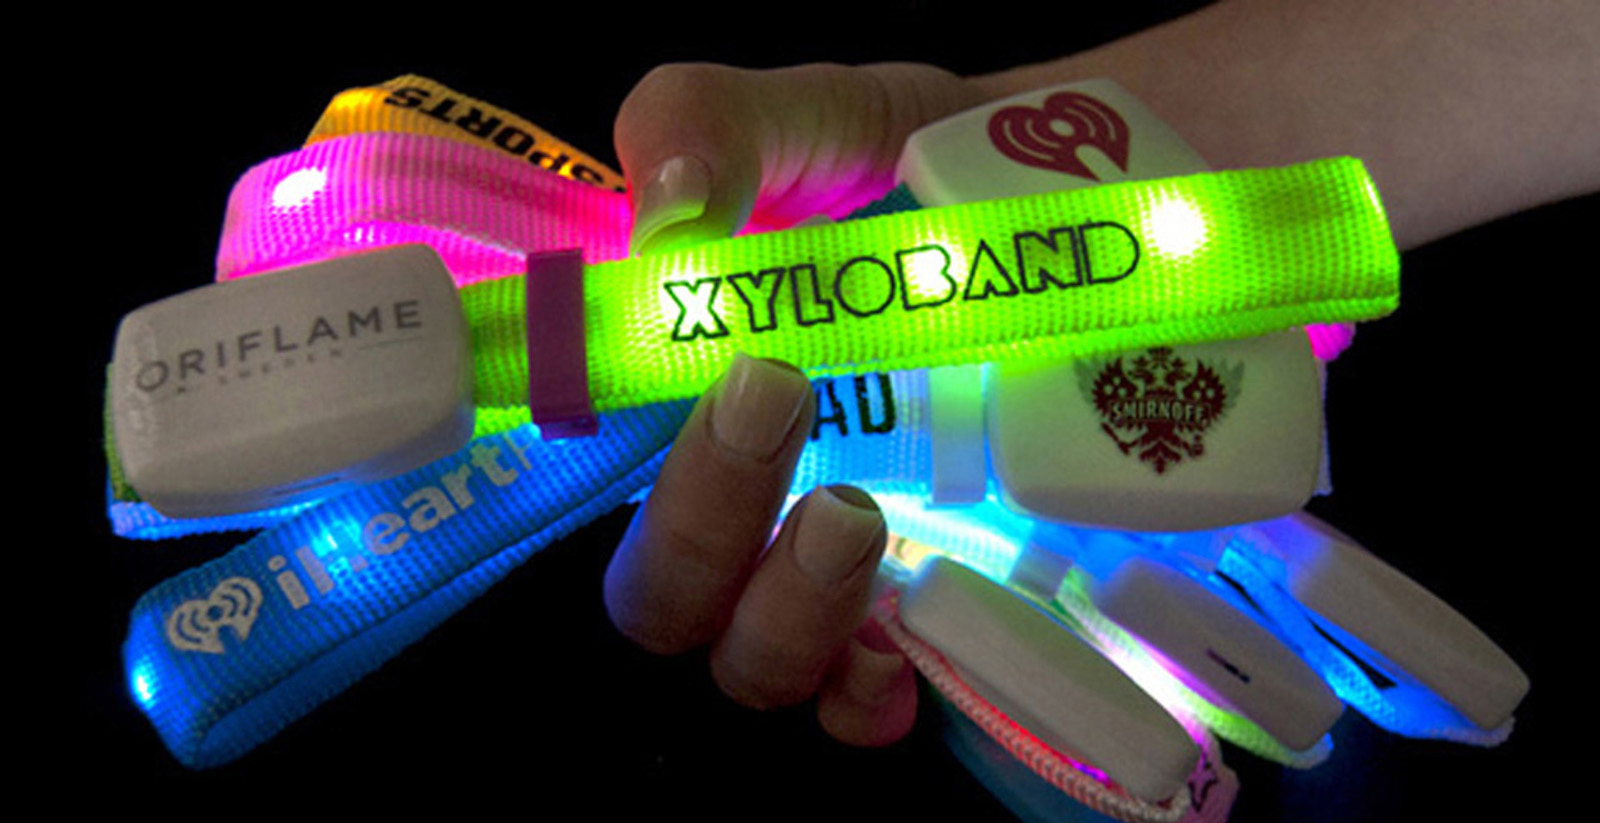 Xylobands USA handfull